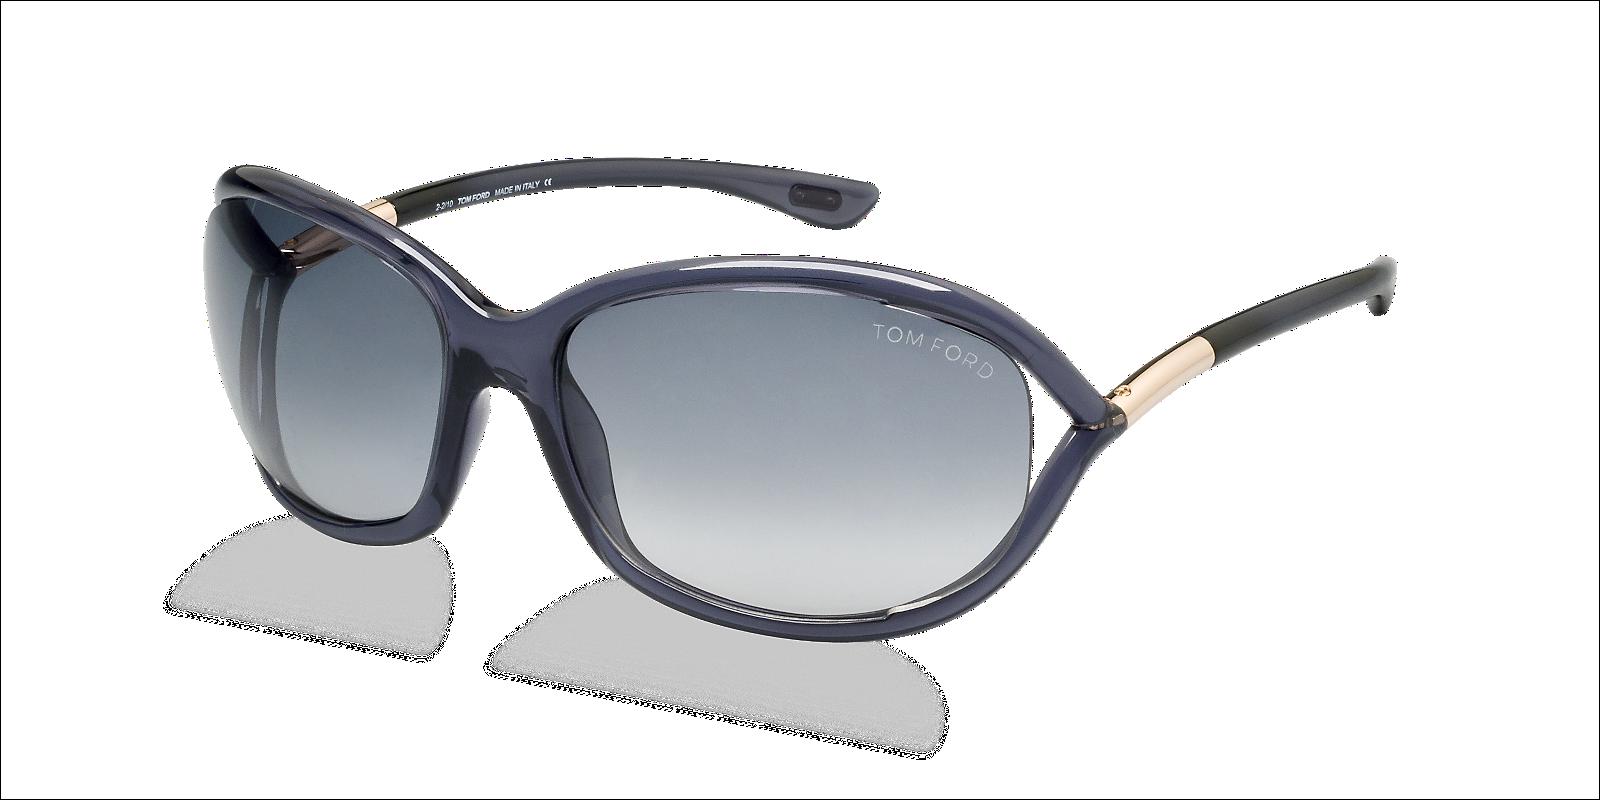 66b8f106bcba Tom Ford Jennifer sunglasses - high style for luxury travel